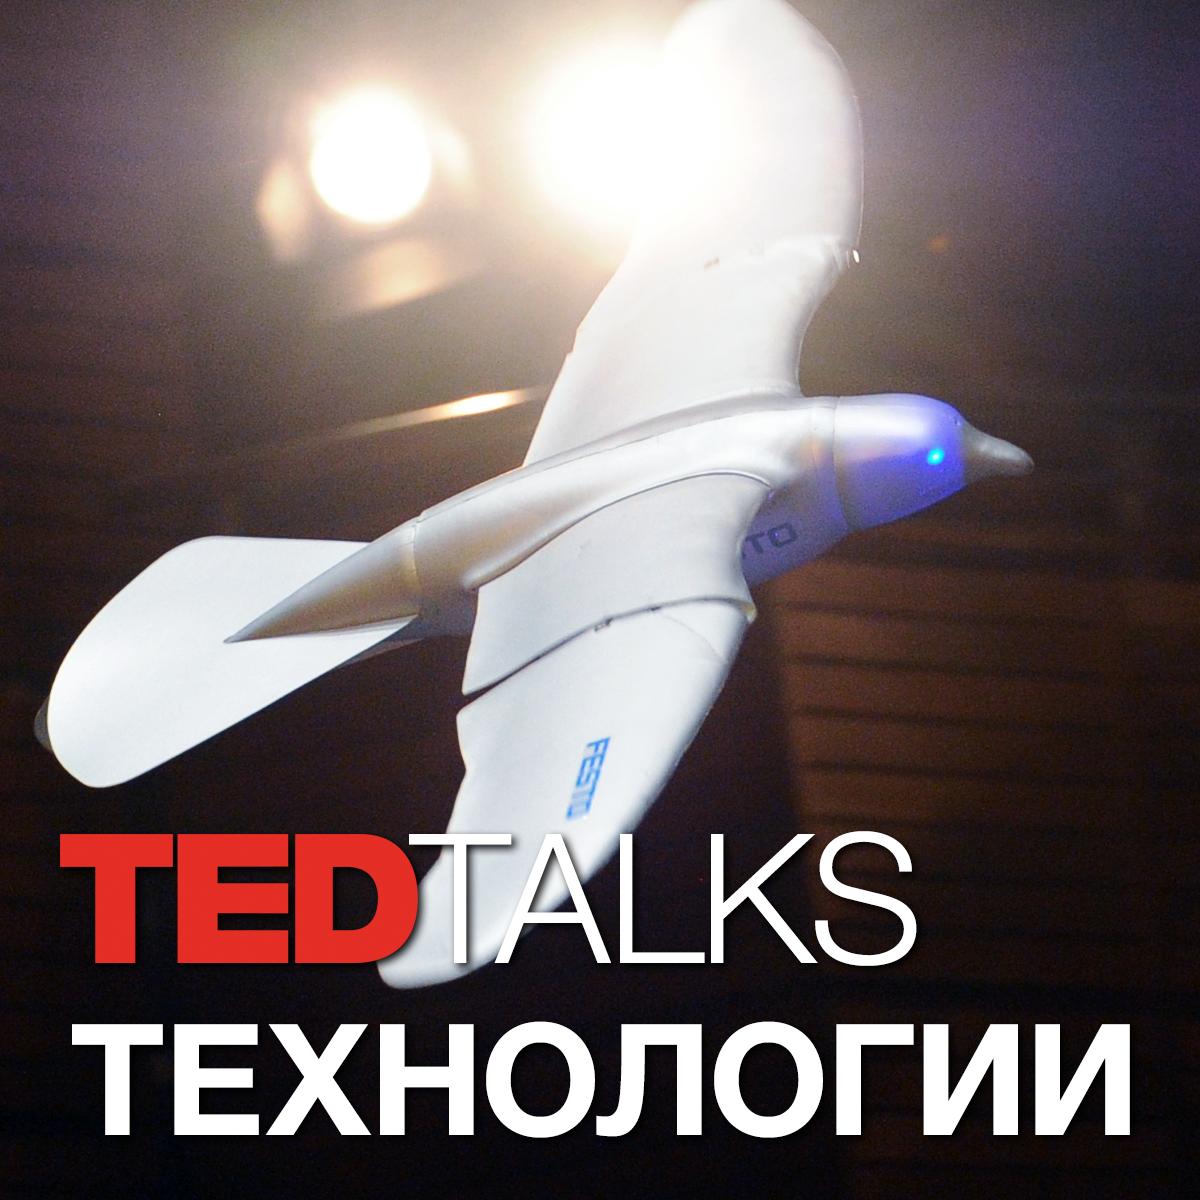 TEDTalks Технологии